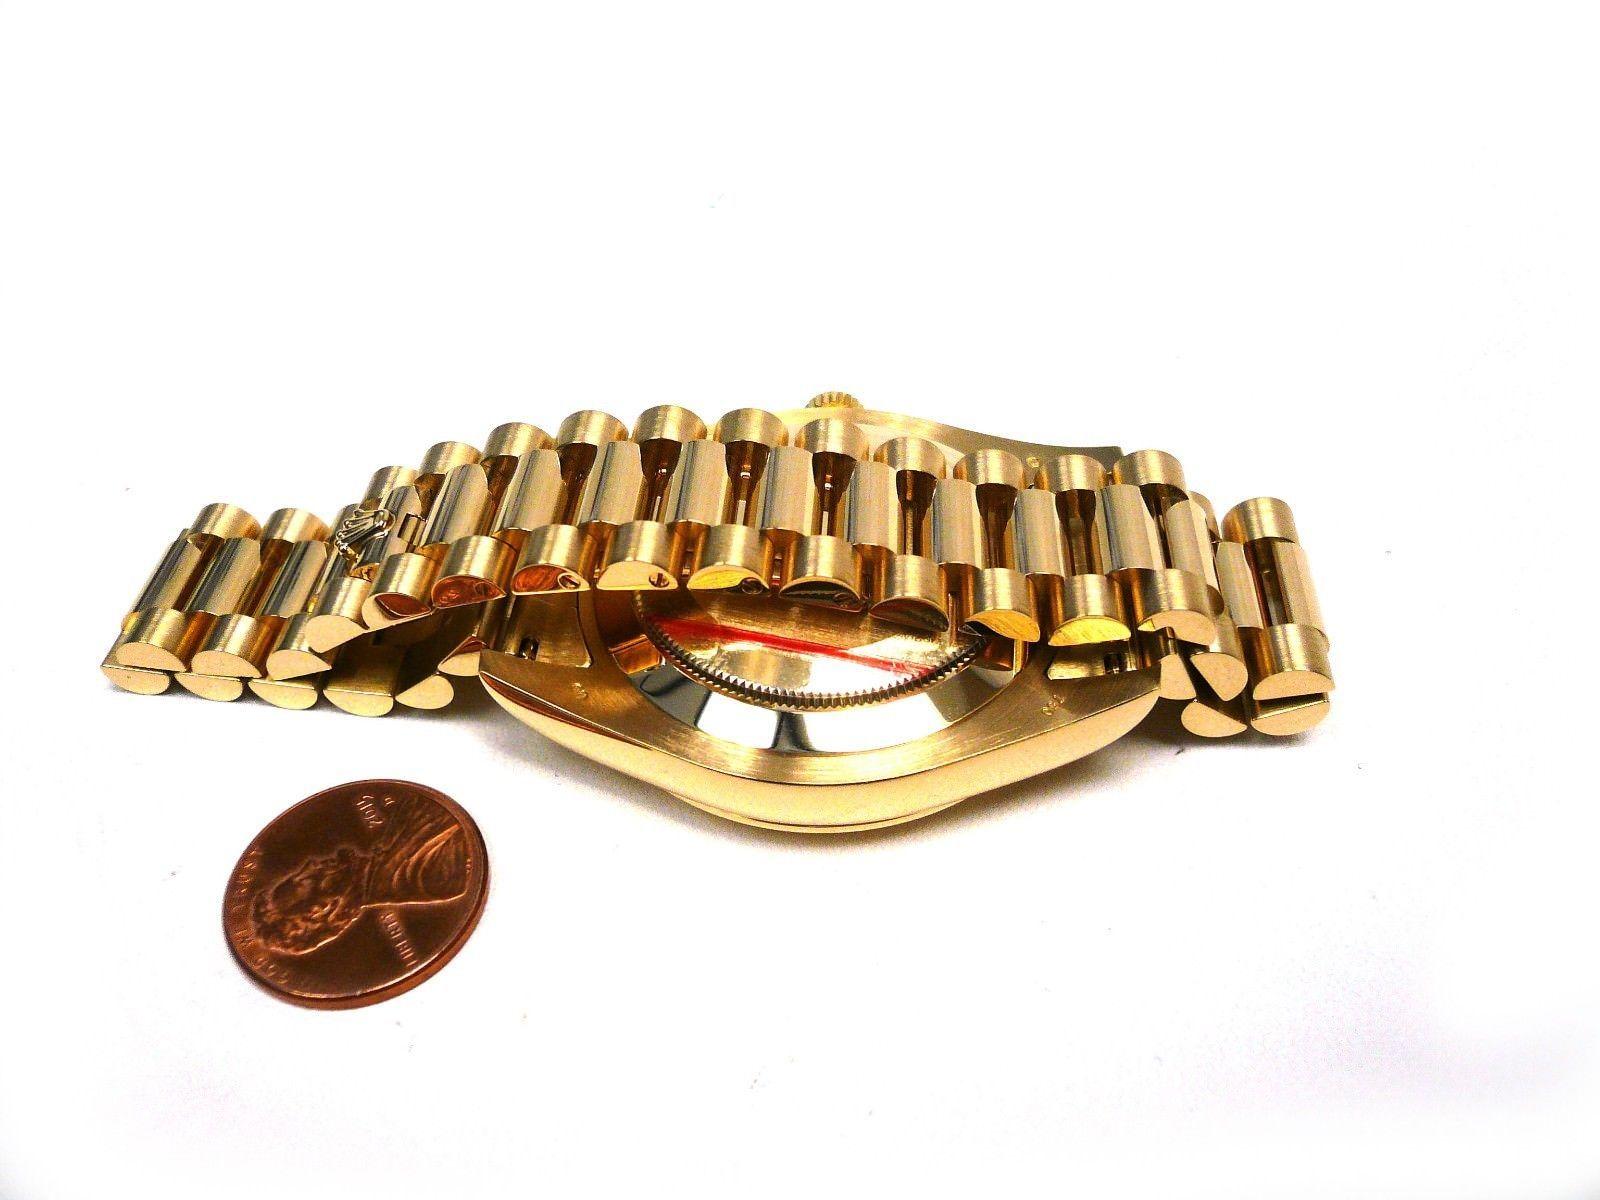 Rolex daydate ii k gold president bracelet box and cert